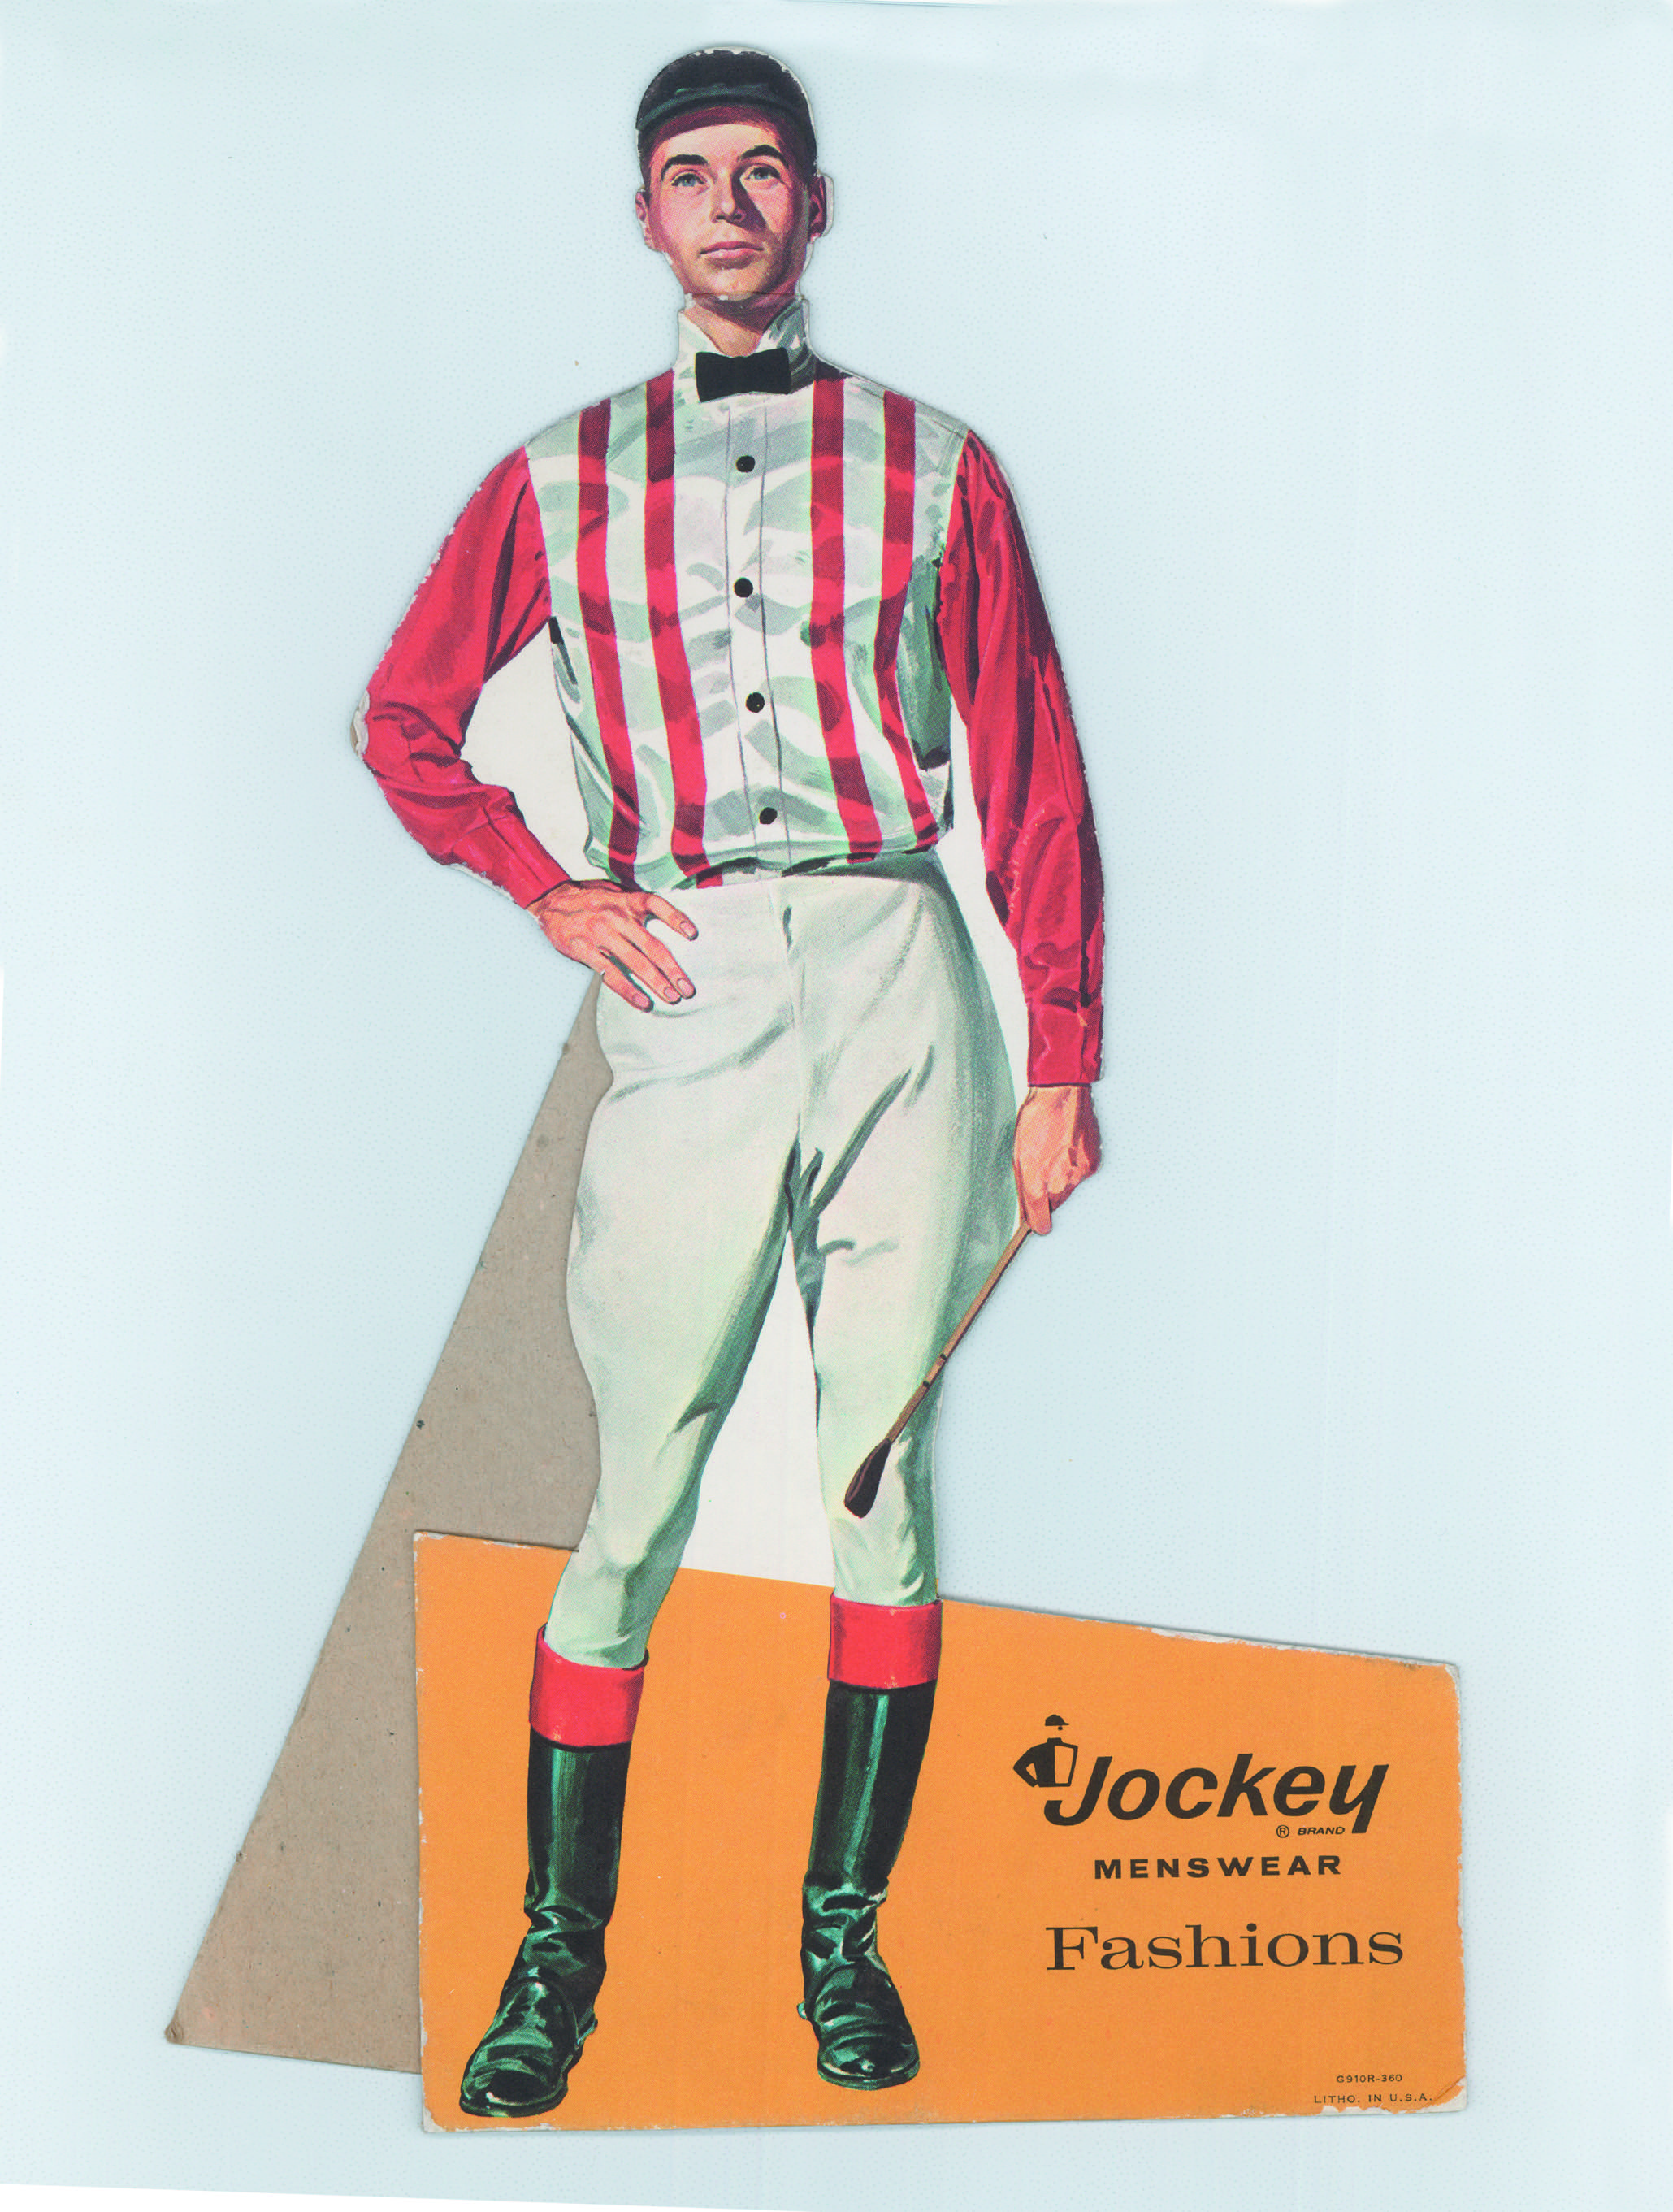 1940 - Pg 63 Jockey boyr1.jpg